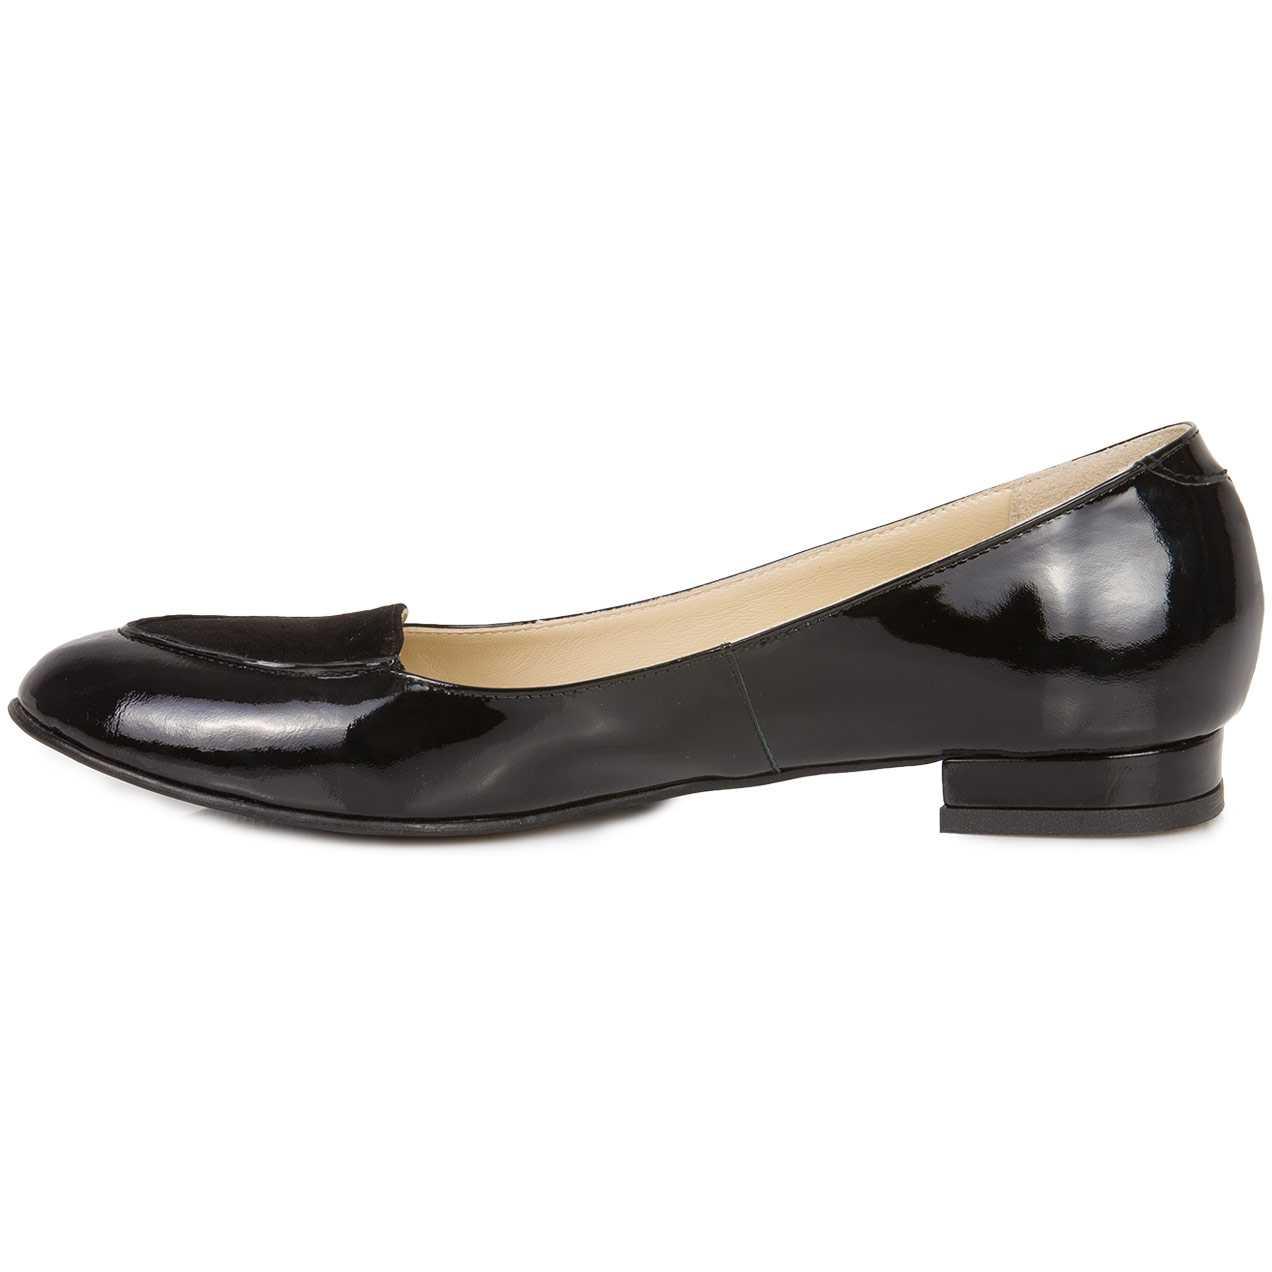 Pantofi negri din piele naturala model M52